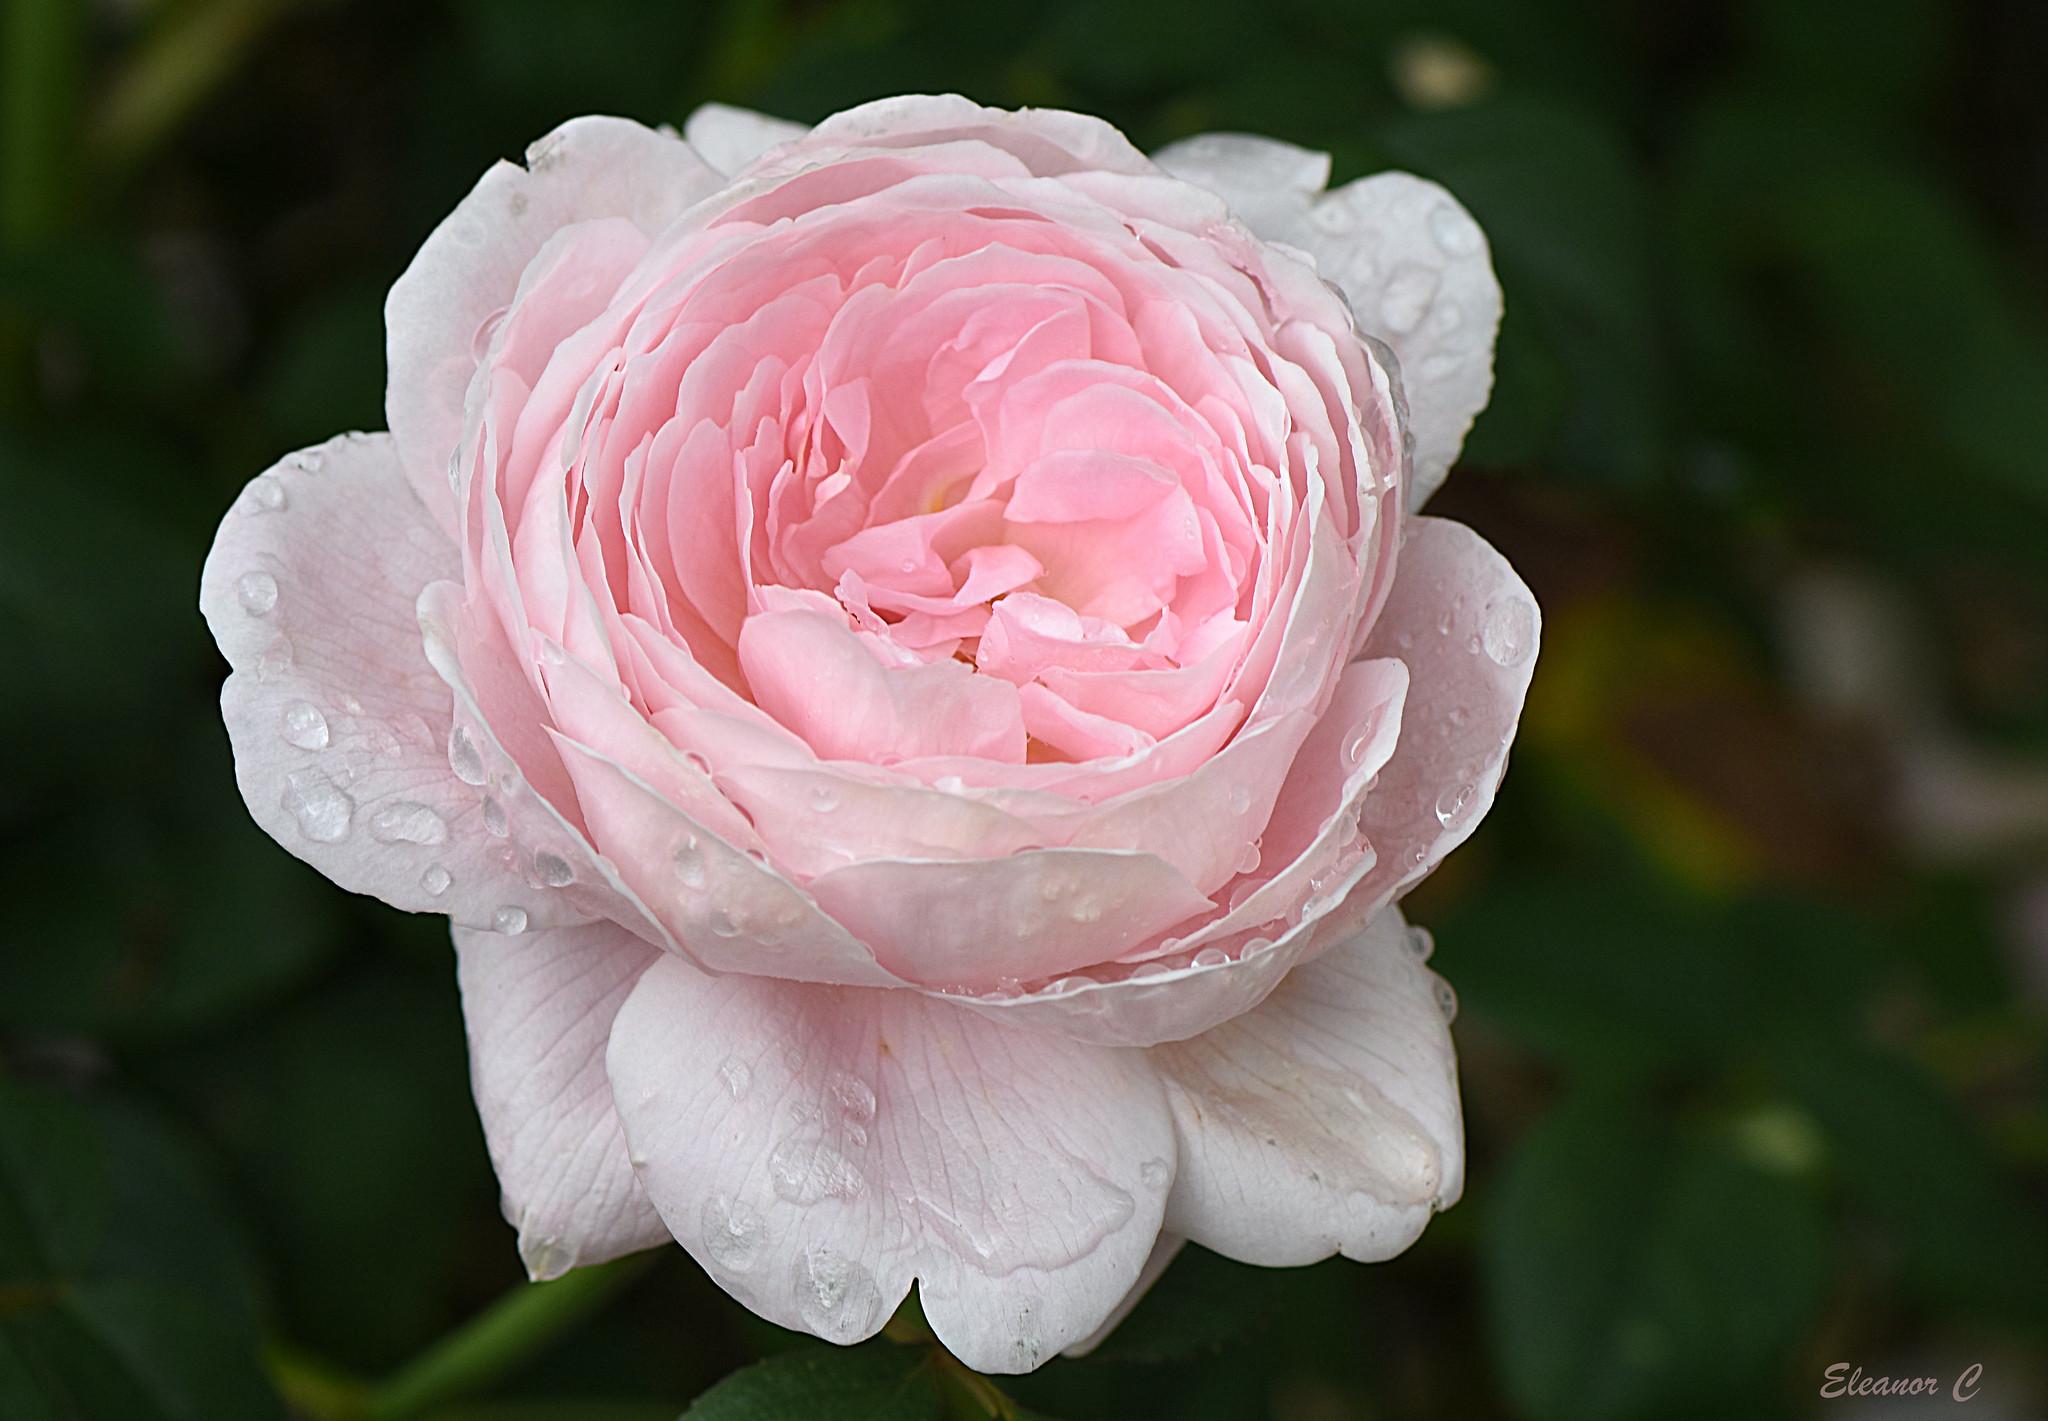 Hình dáng hoa hồng Queen of Sweden rose